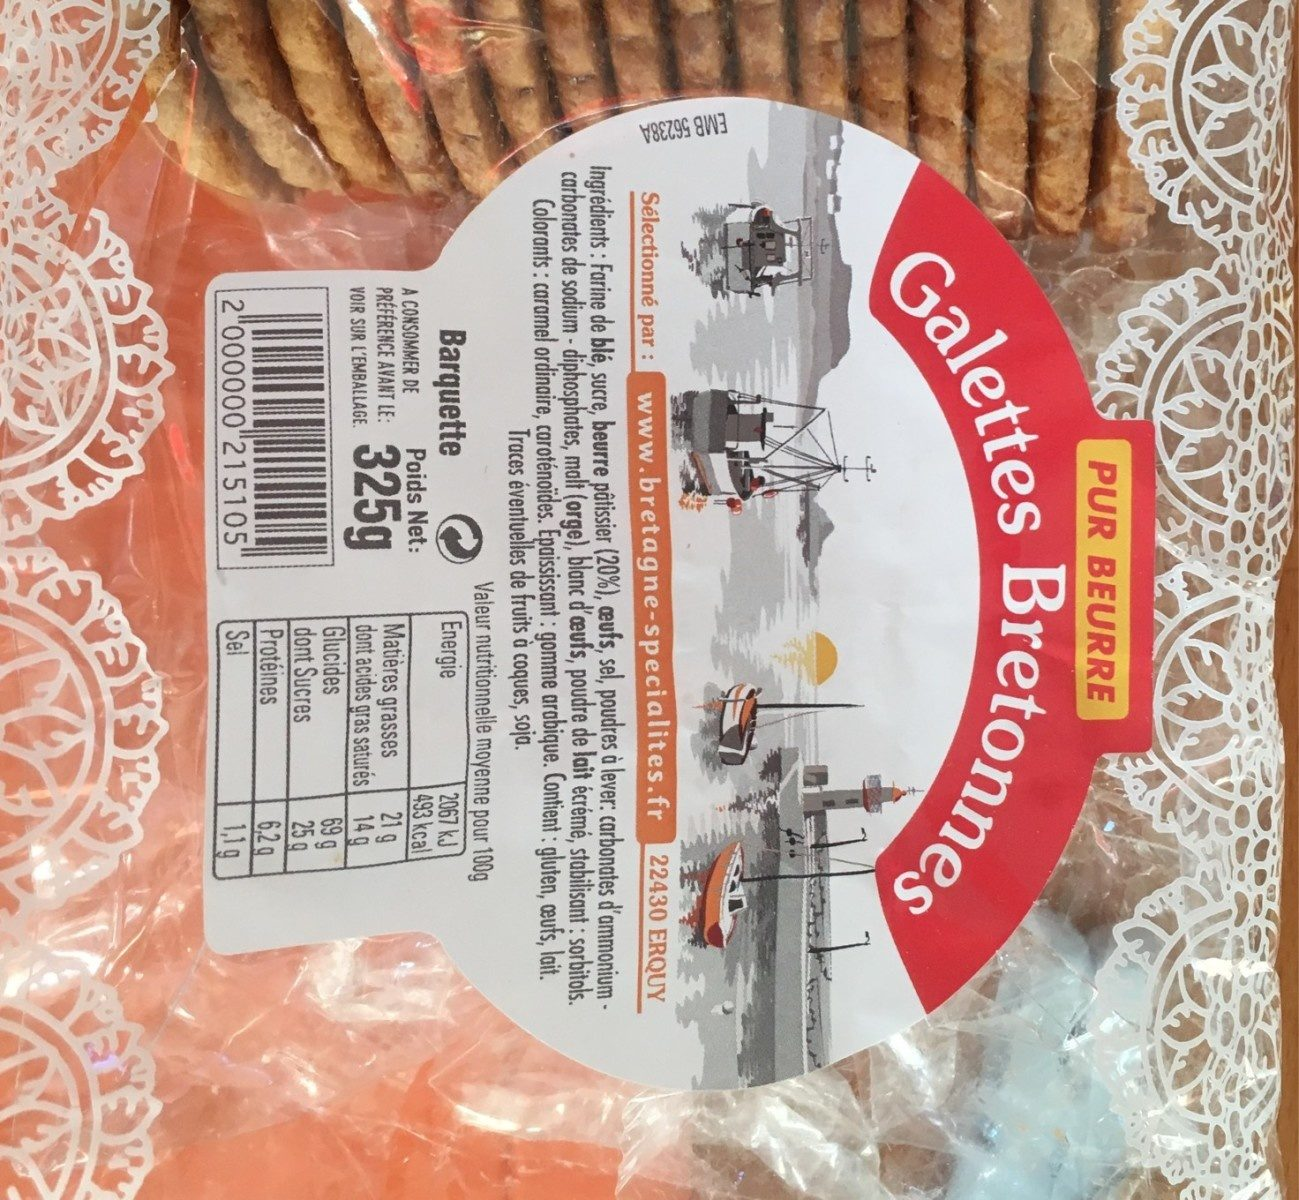 Galette bretonnes - Produit - fr